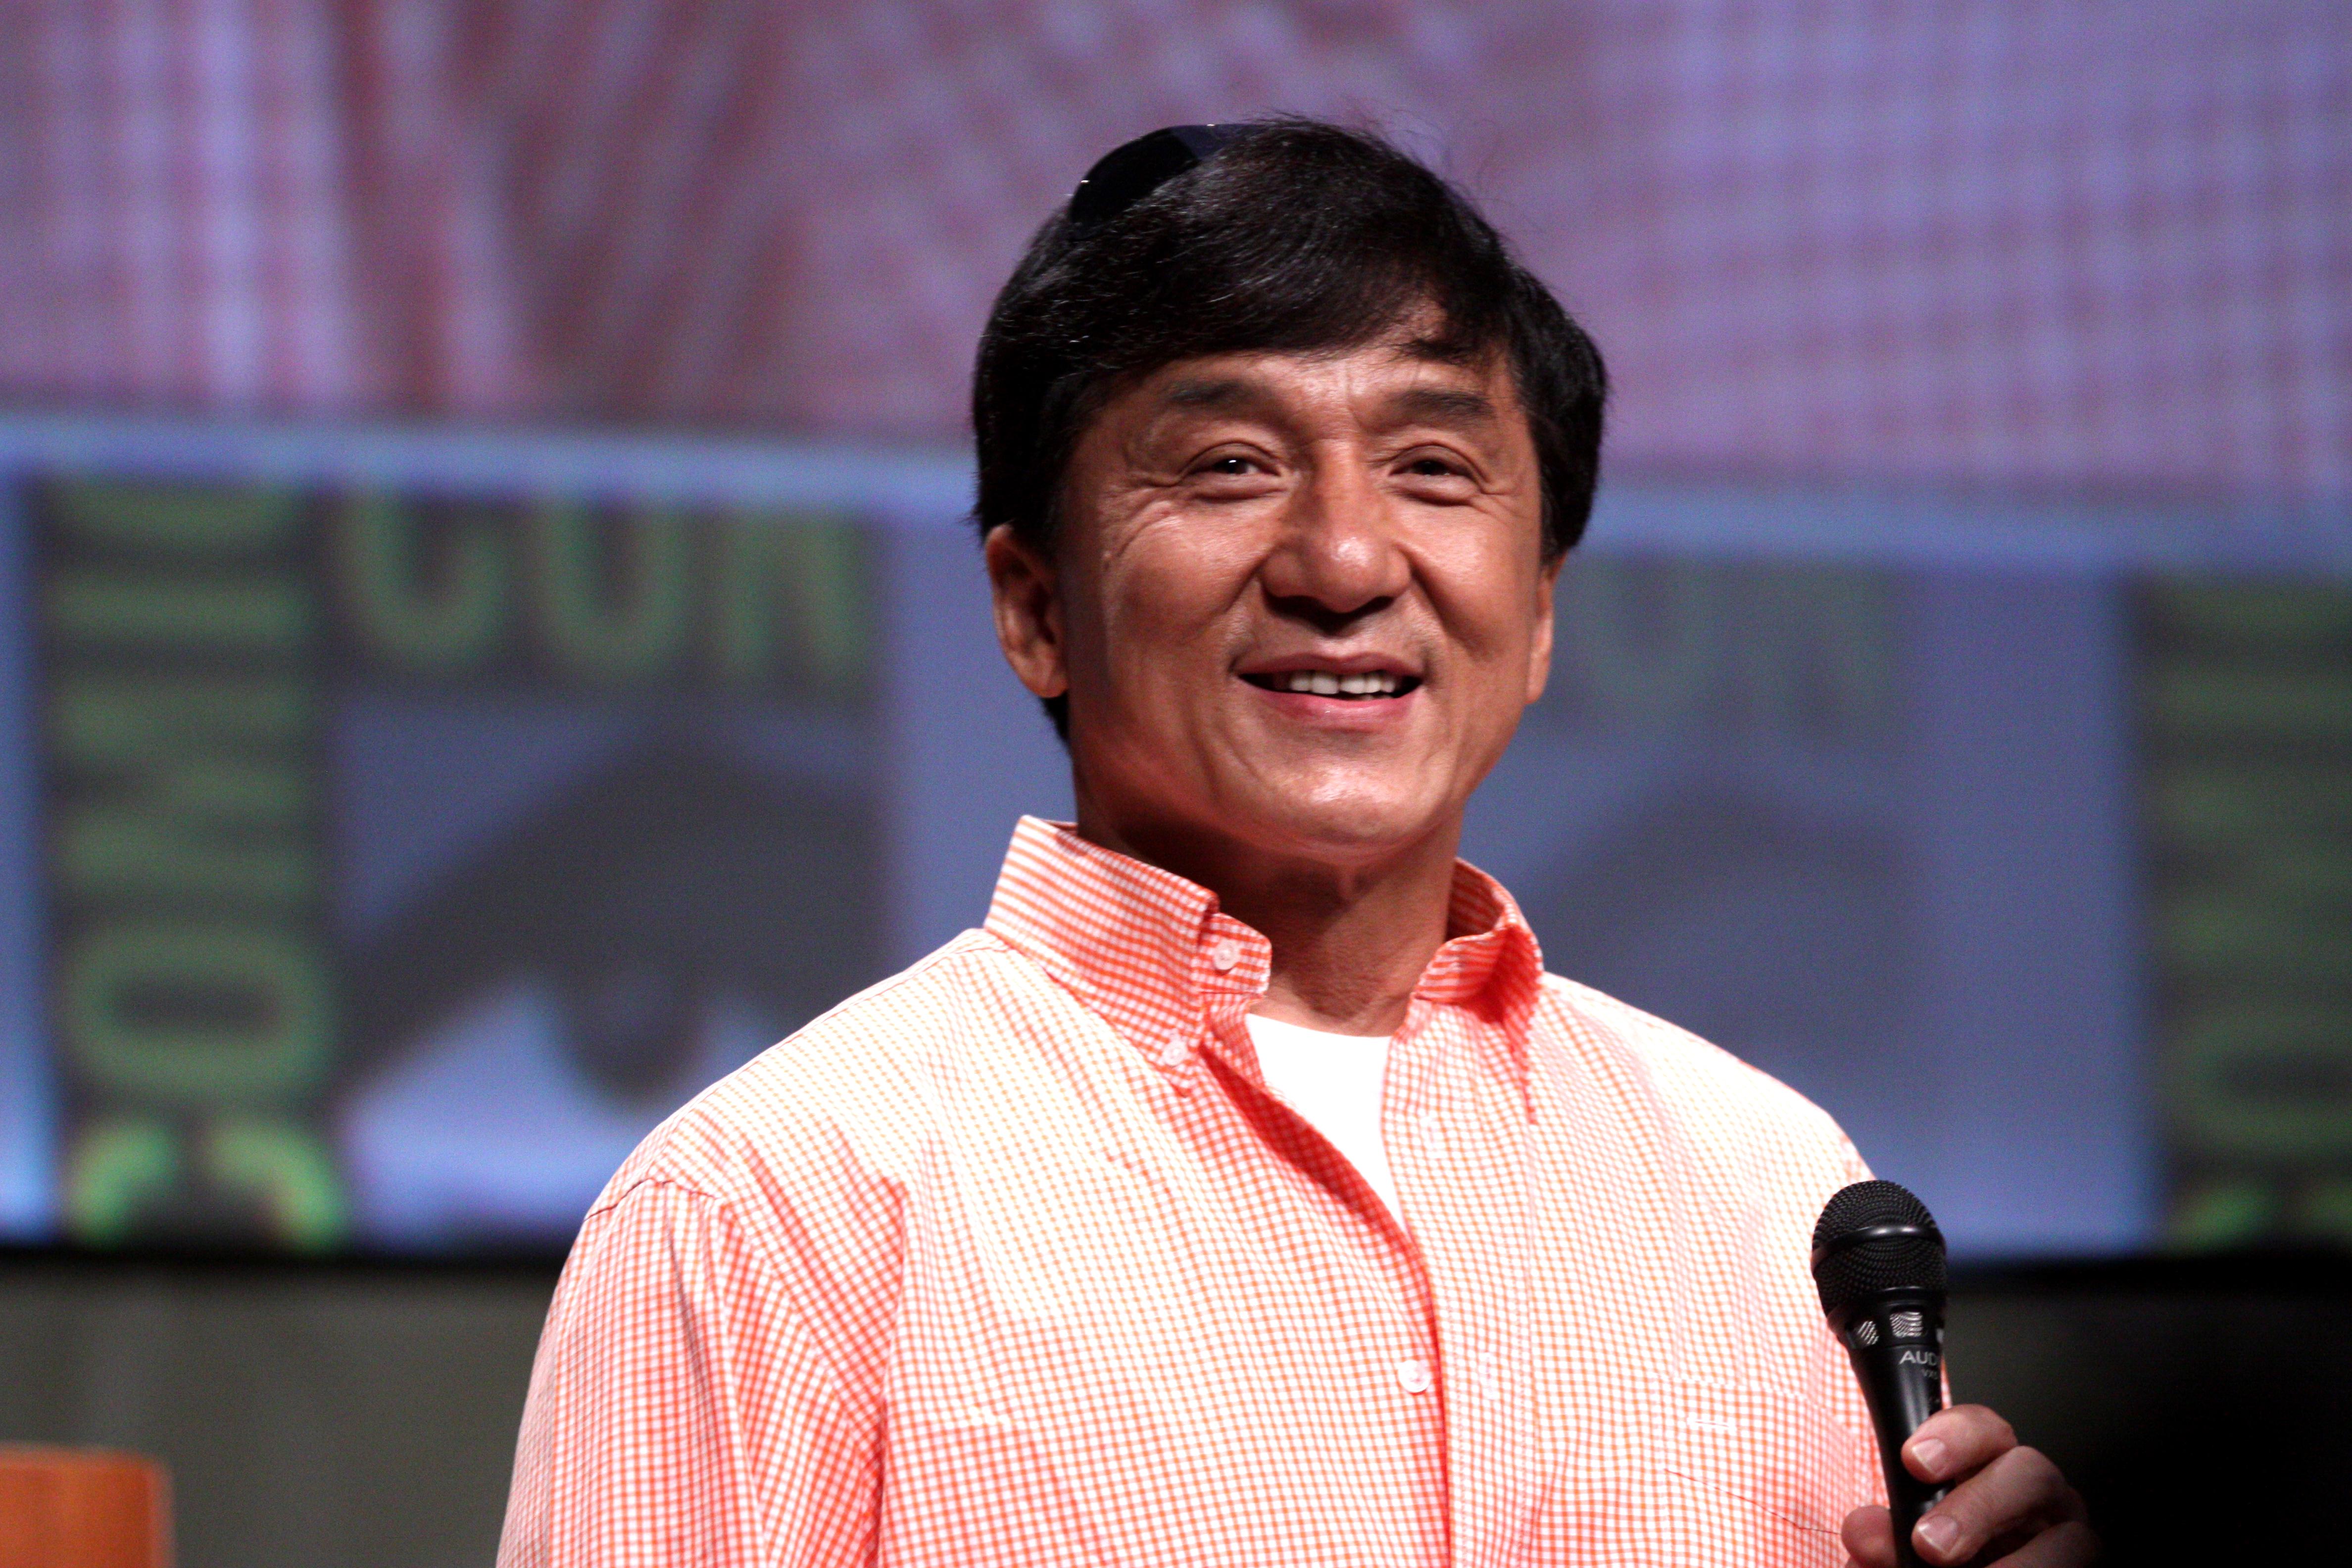 Jackie Chan photo #105232, Jackie Chan image